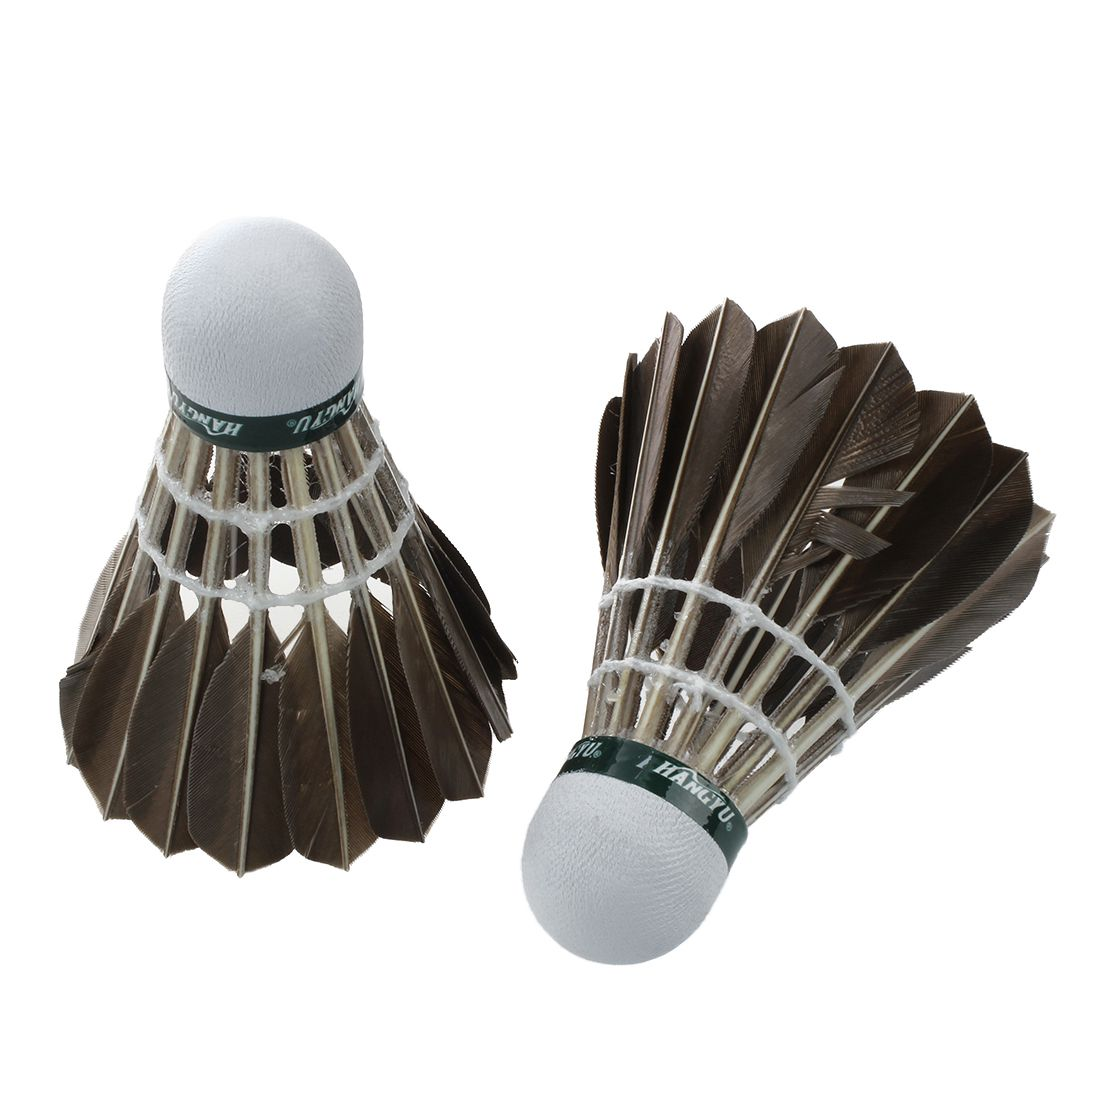 12pcs Training Goose Feather Shuttlecocks Badminton Balls Game Sport